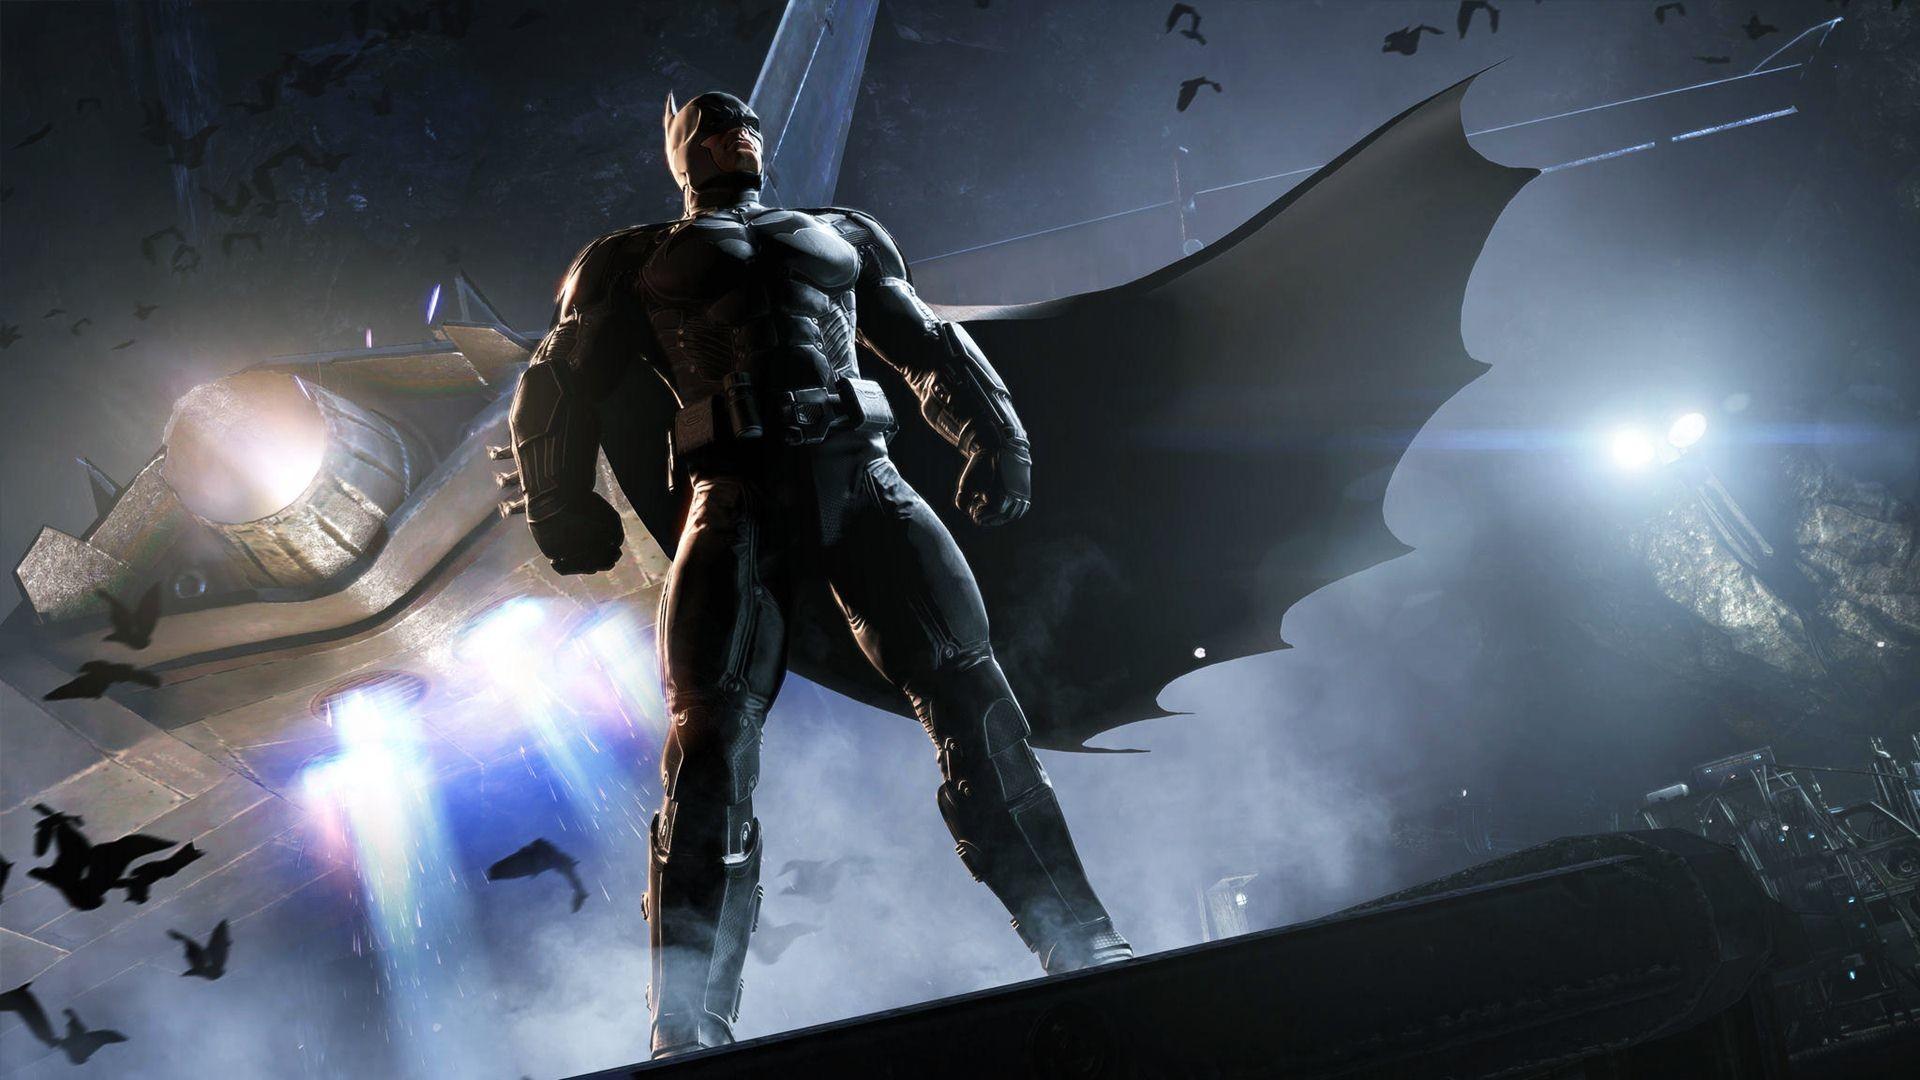 BATMAN ARKHAM KNIGHT Play Arts Kai Nightwing Arkham knight   Wallpapers 4k    Pinterest   Batman arkham knight, Arkham knight and Nightwing